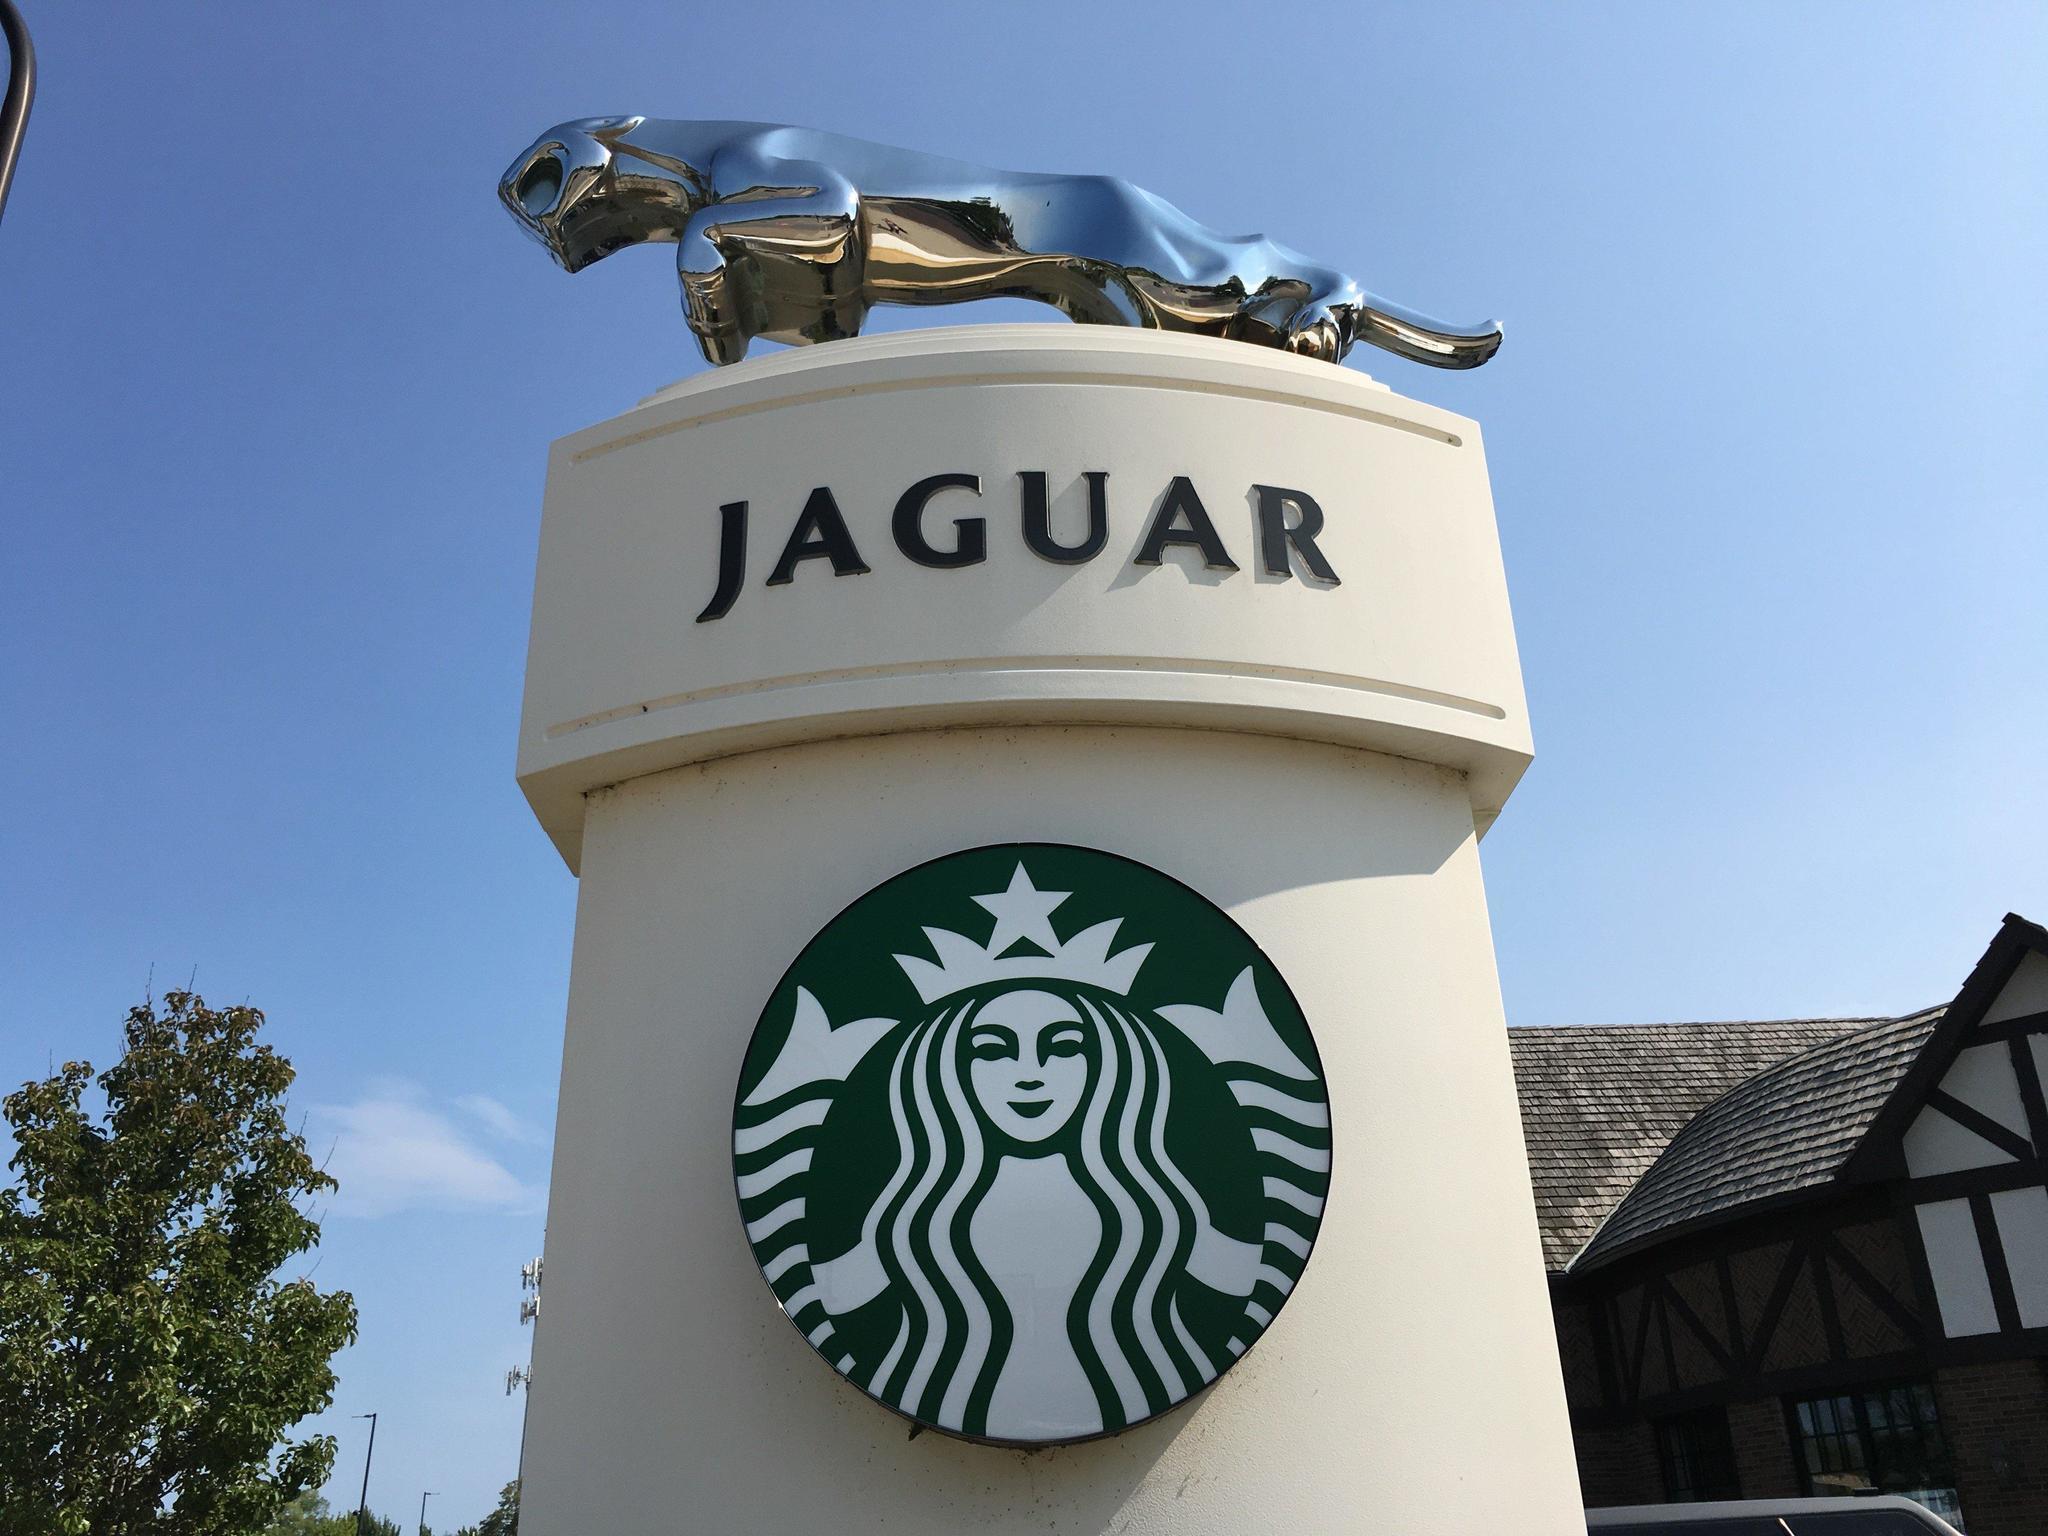 Imperial motors jaguar dealership closes wilmette location for Imperial motors jaguar of lake bluff